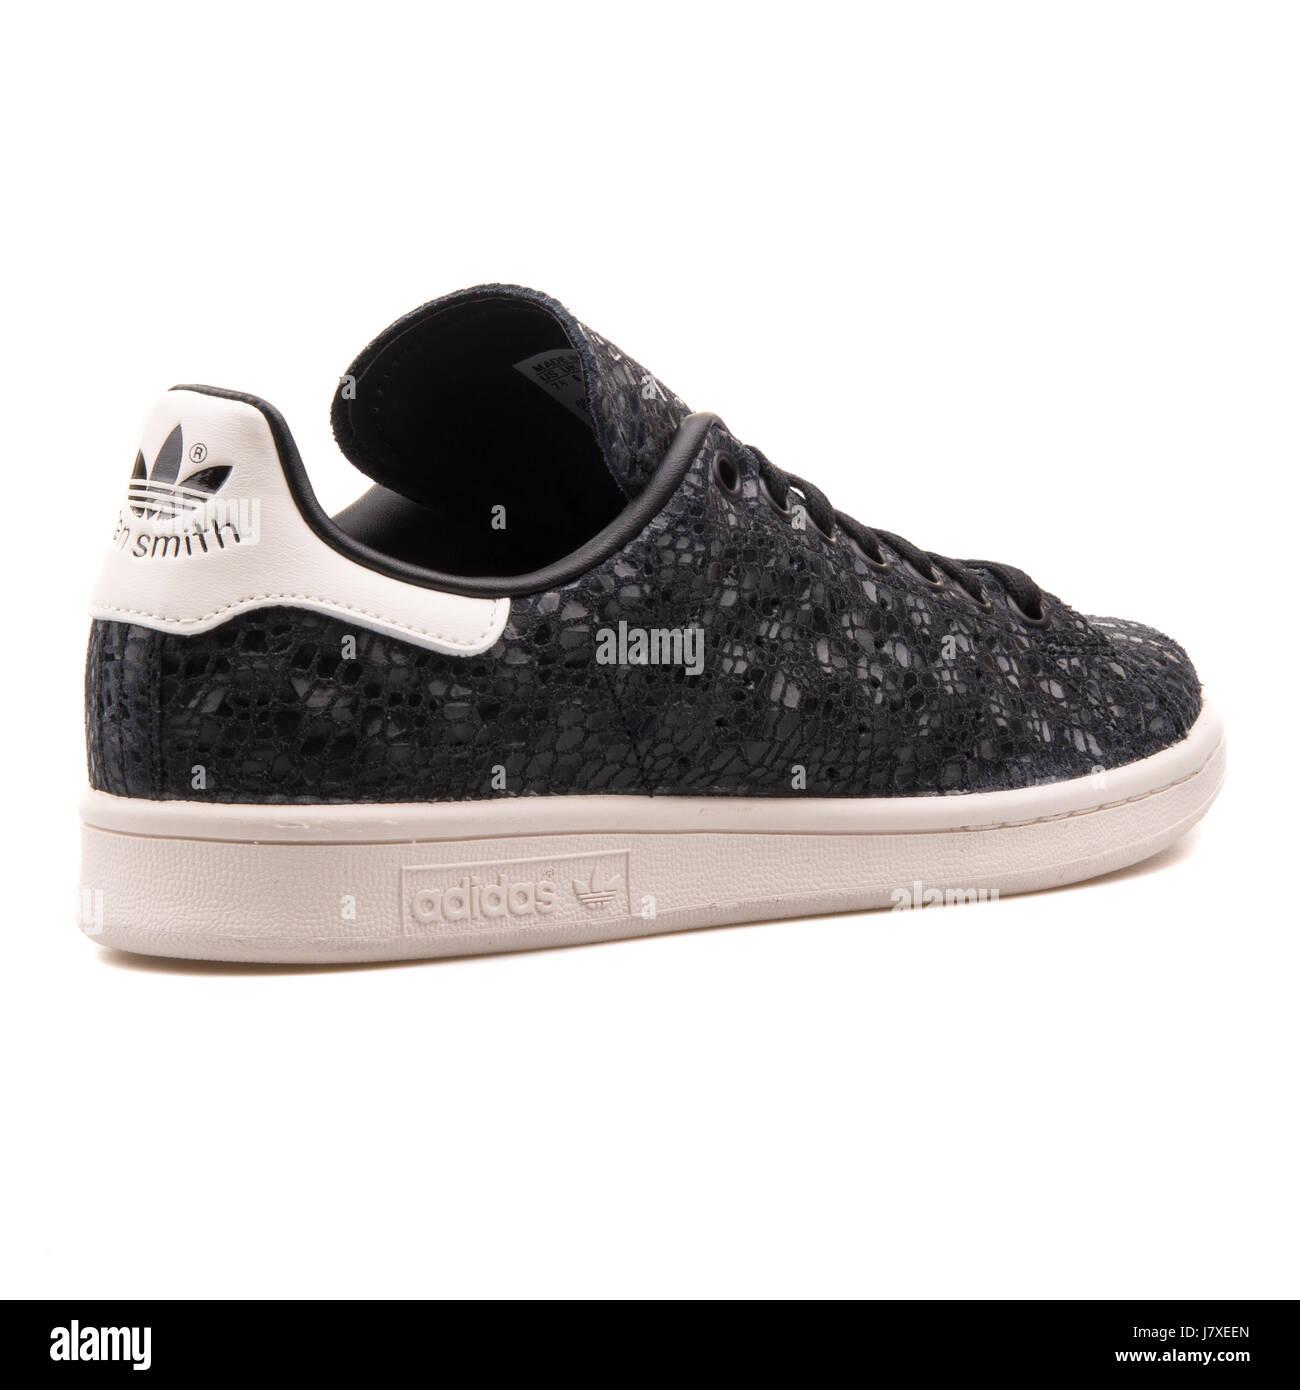 ladies black stan smith trainers